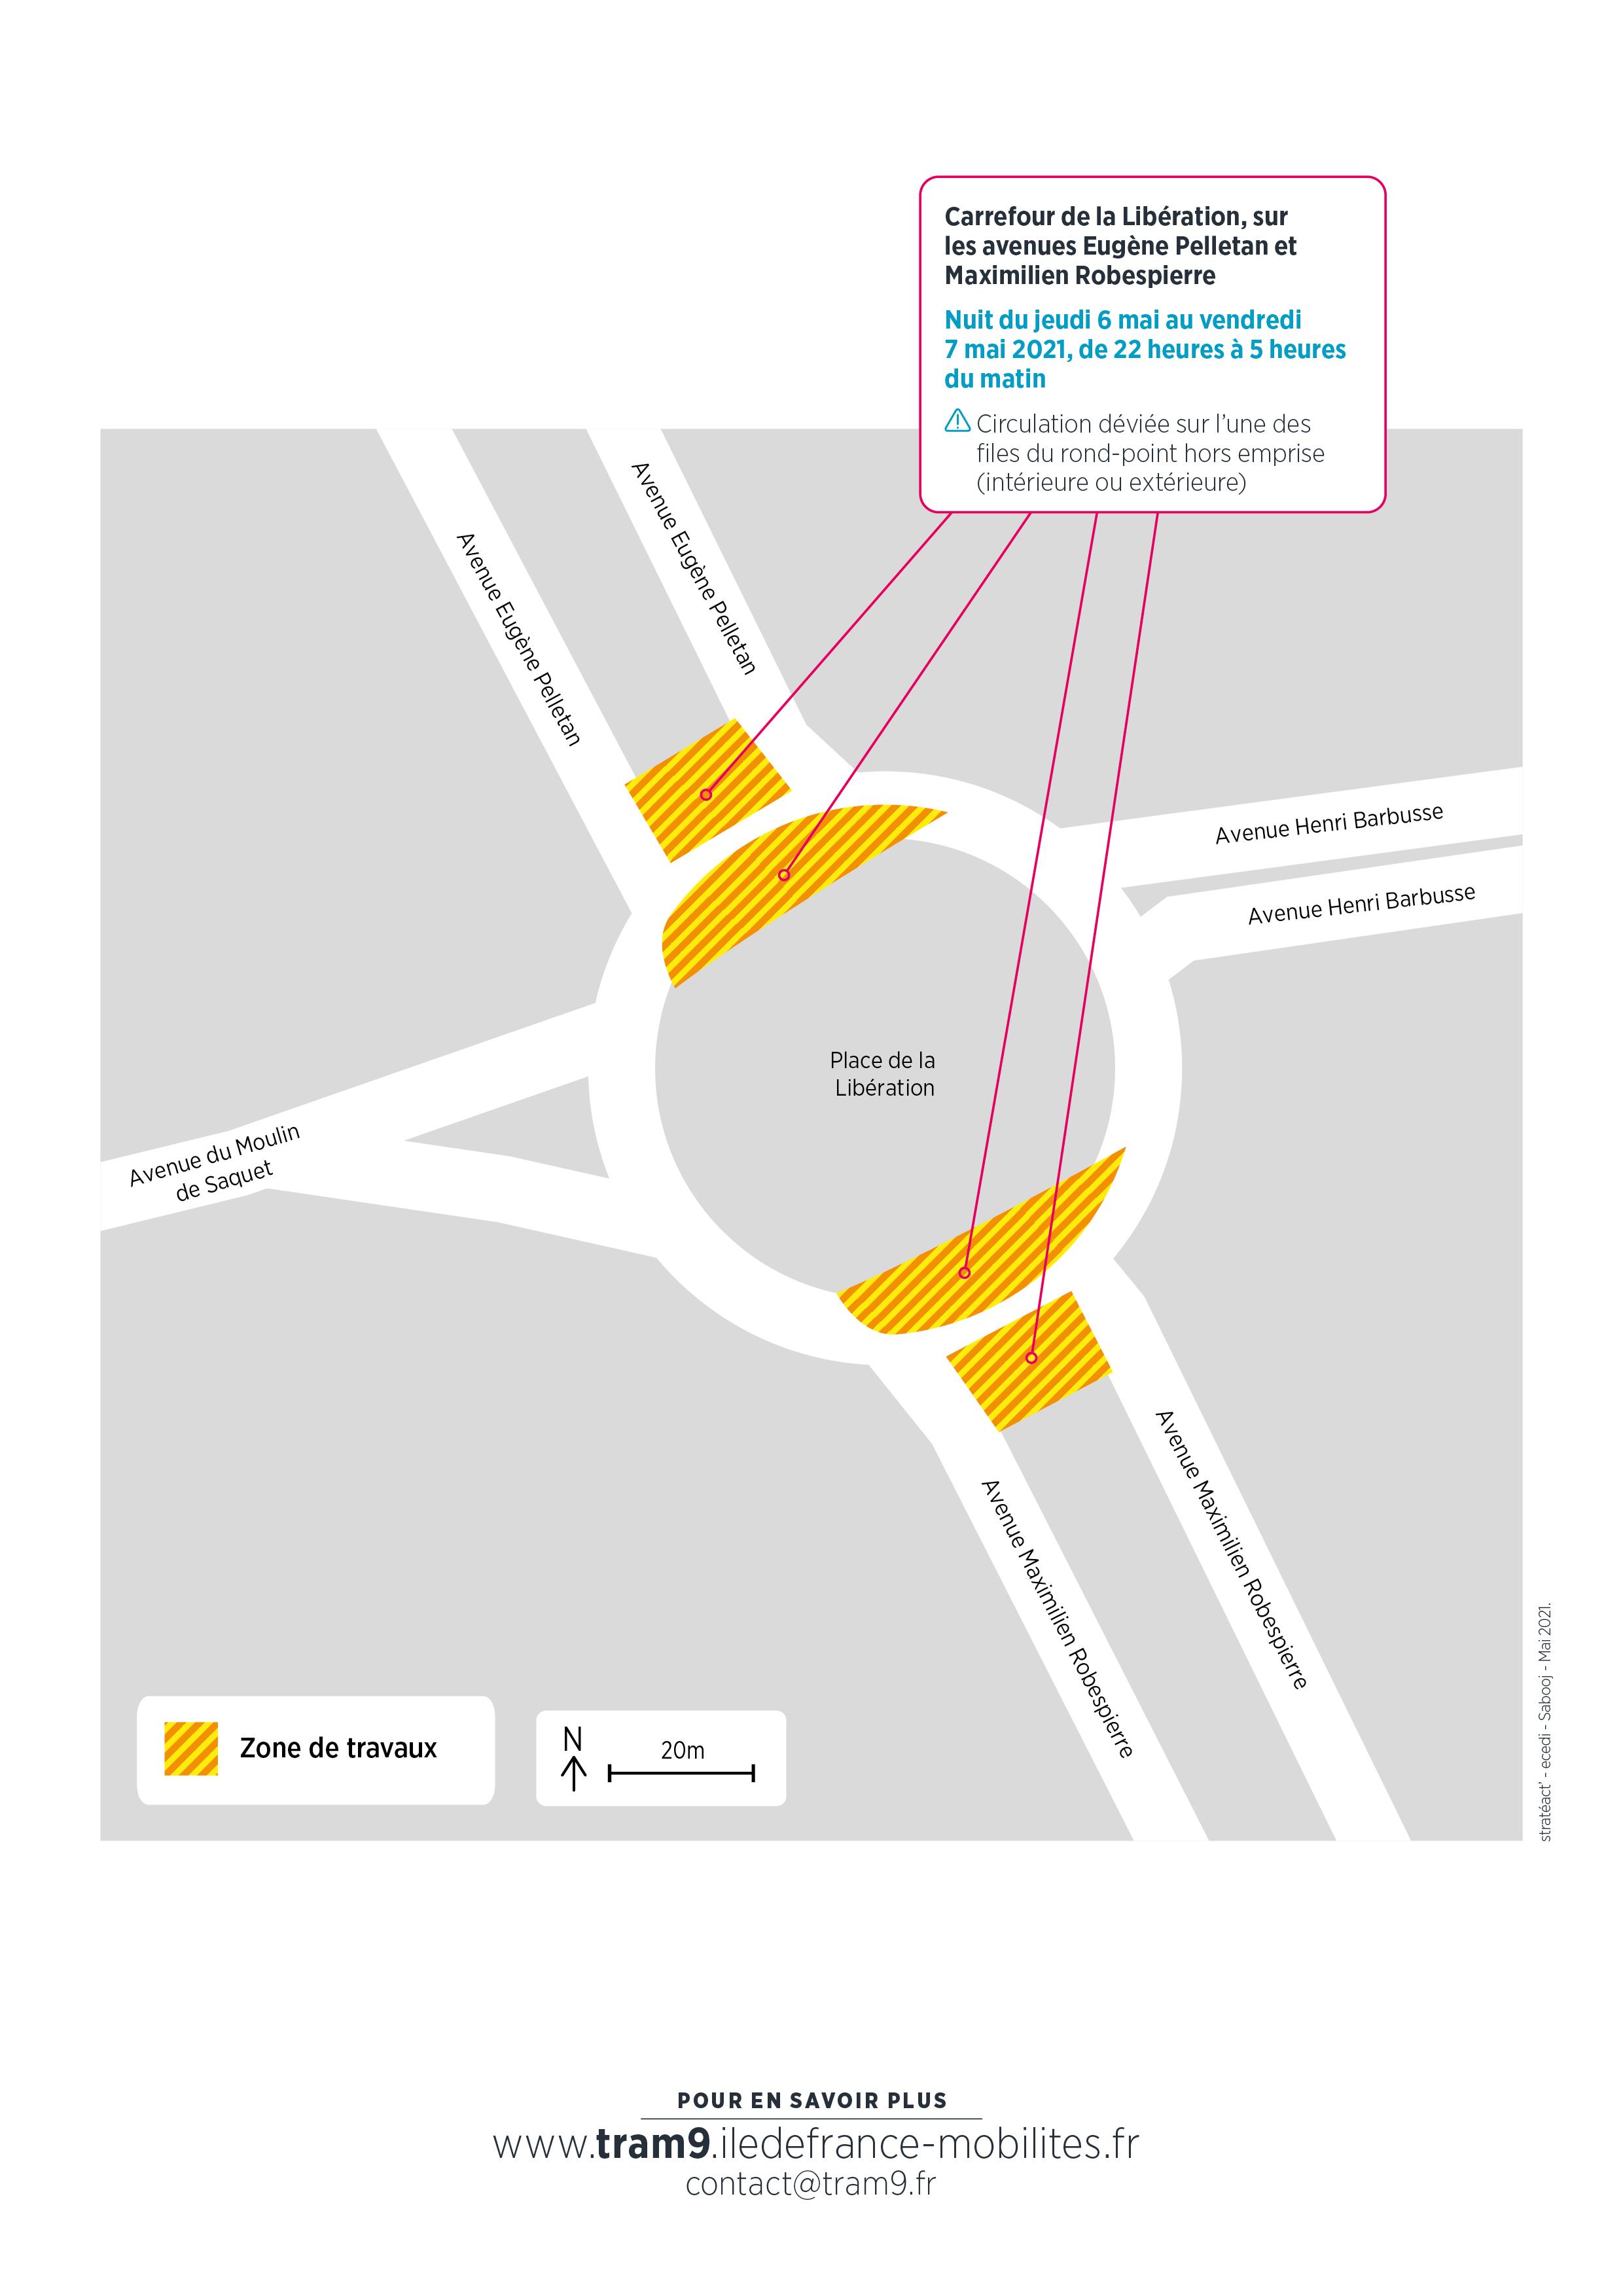 Travaux à Vitry-sur-Seine, mai 2021